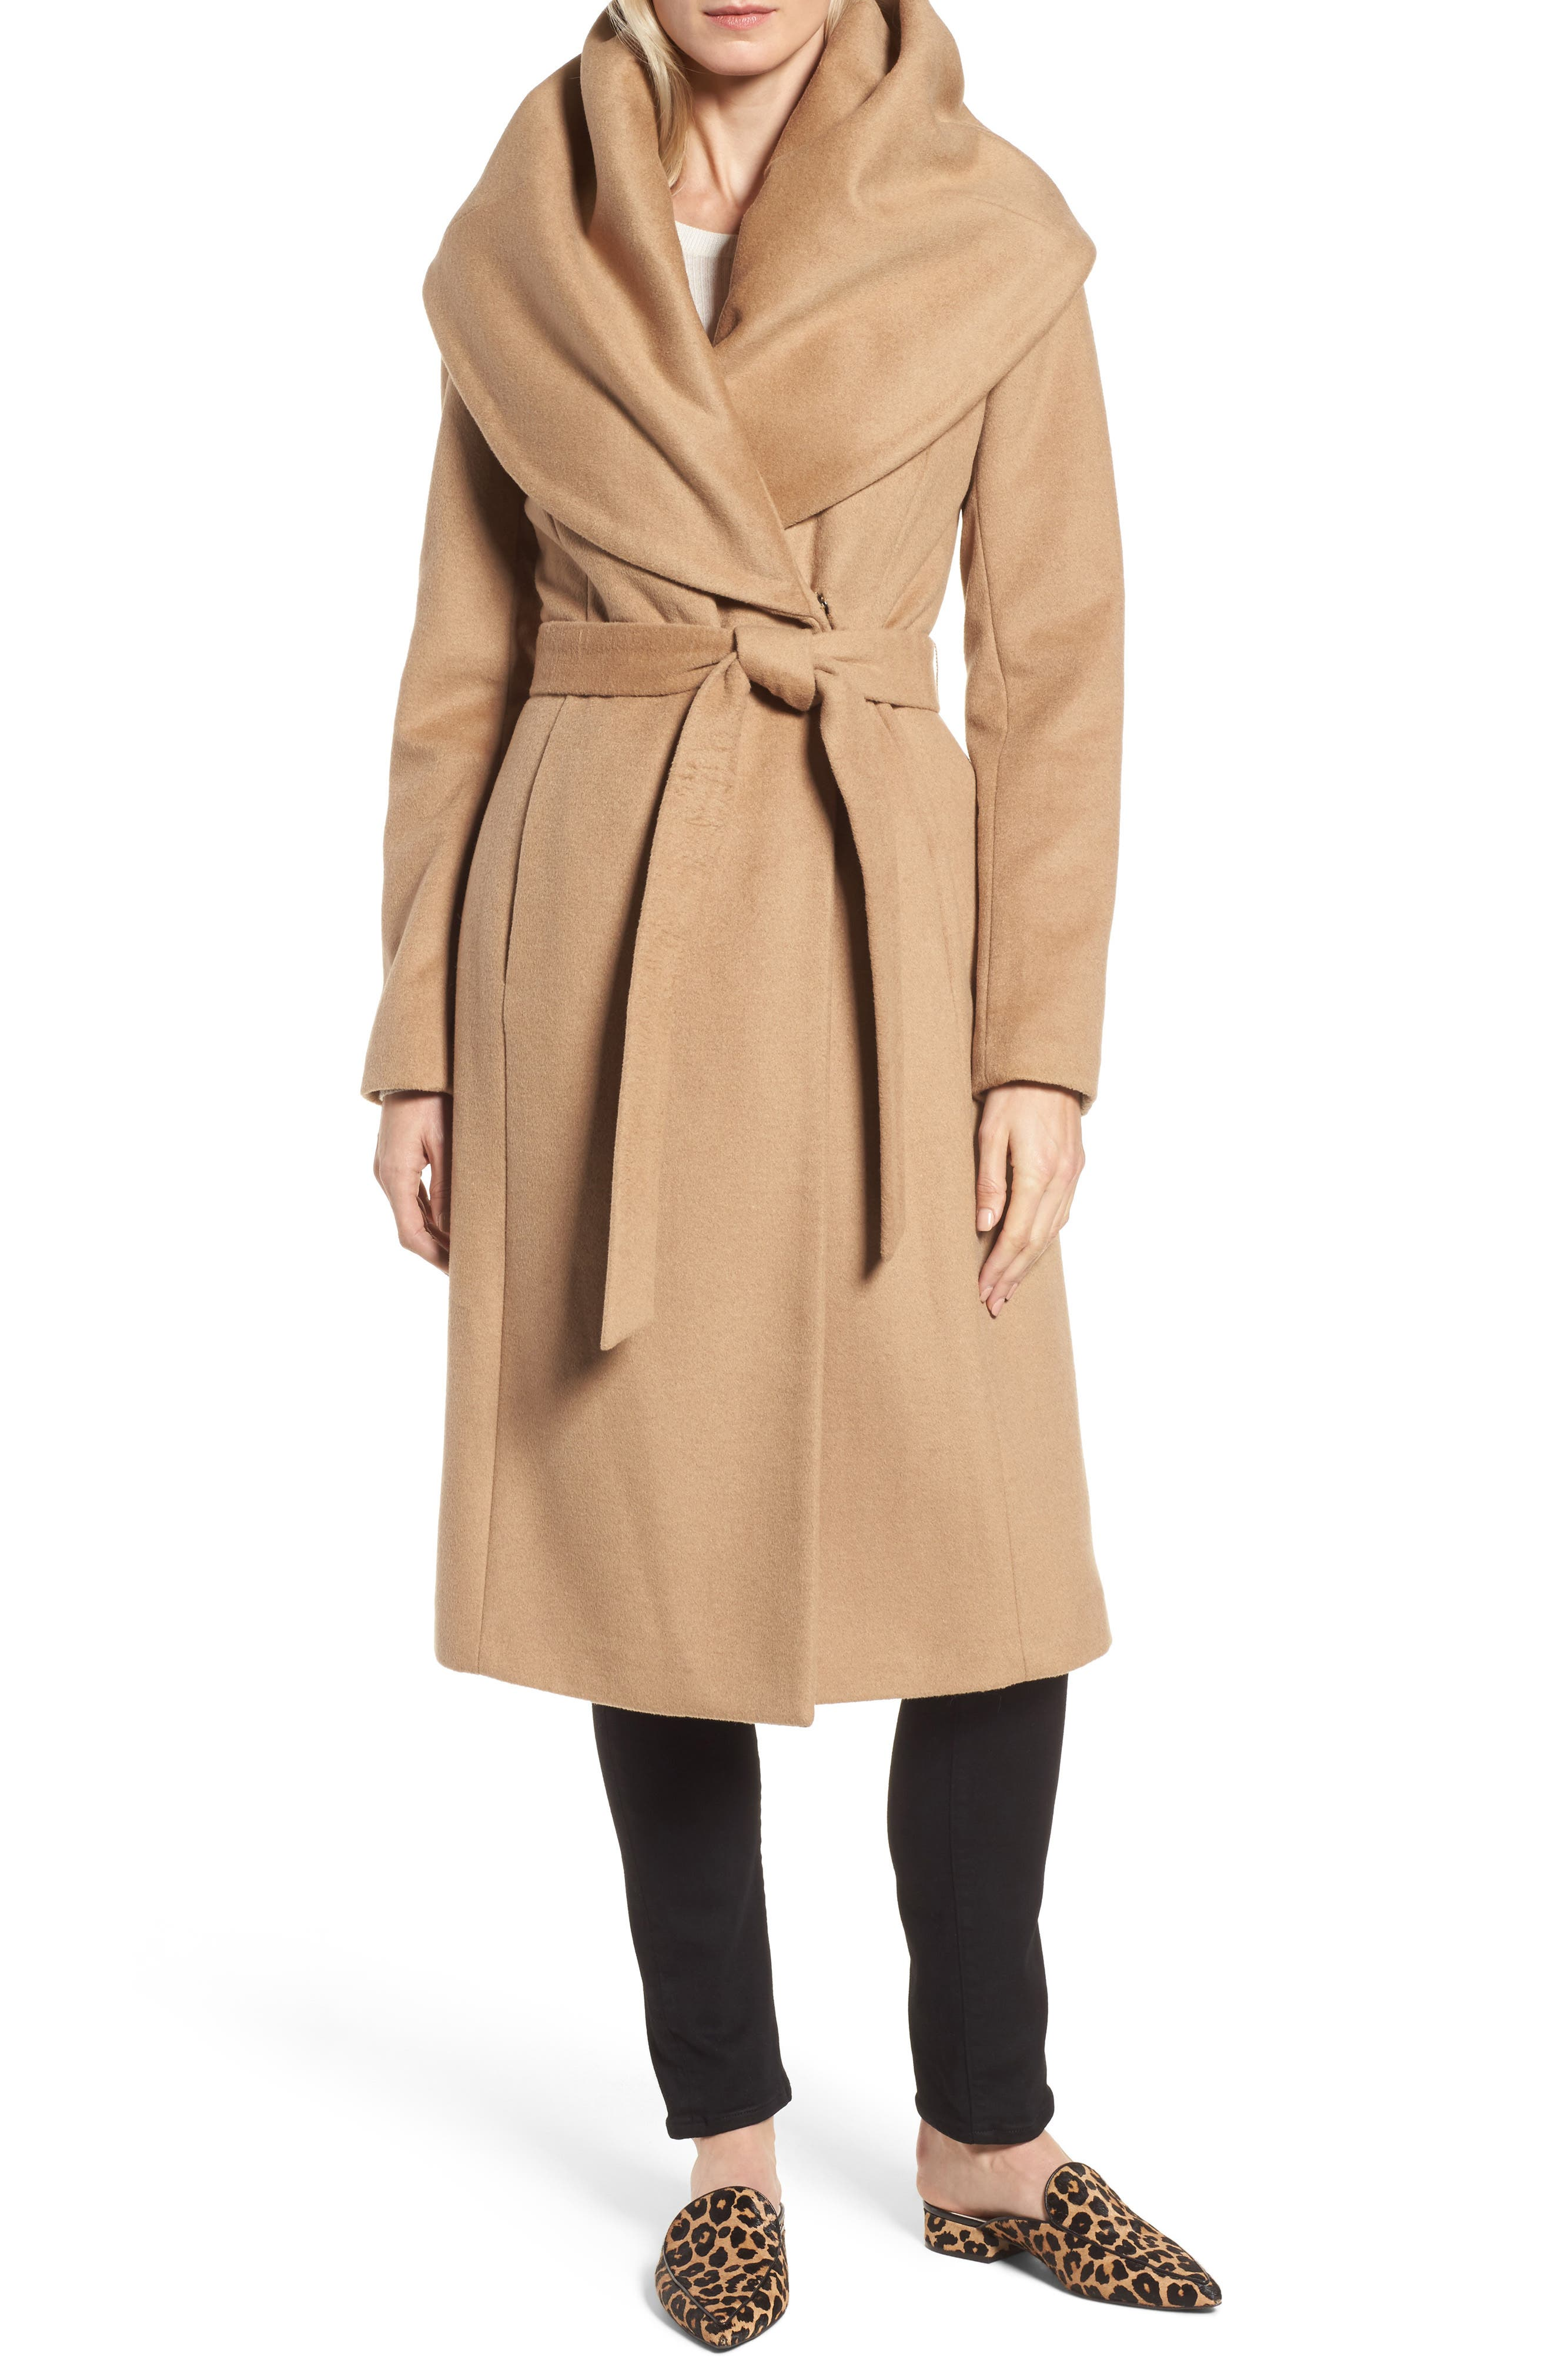 Alternate Image 1 Selected - DKNY Wool Blend Shawl Collar Wrap Coat